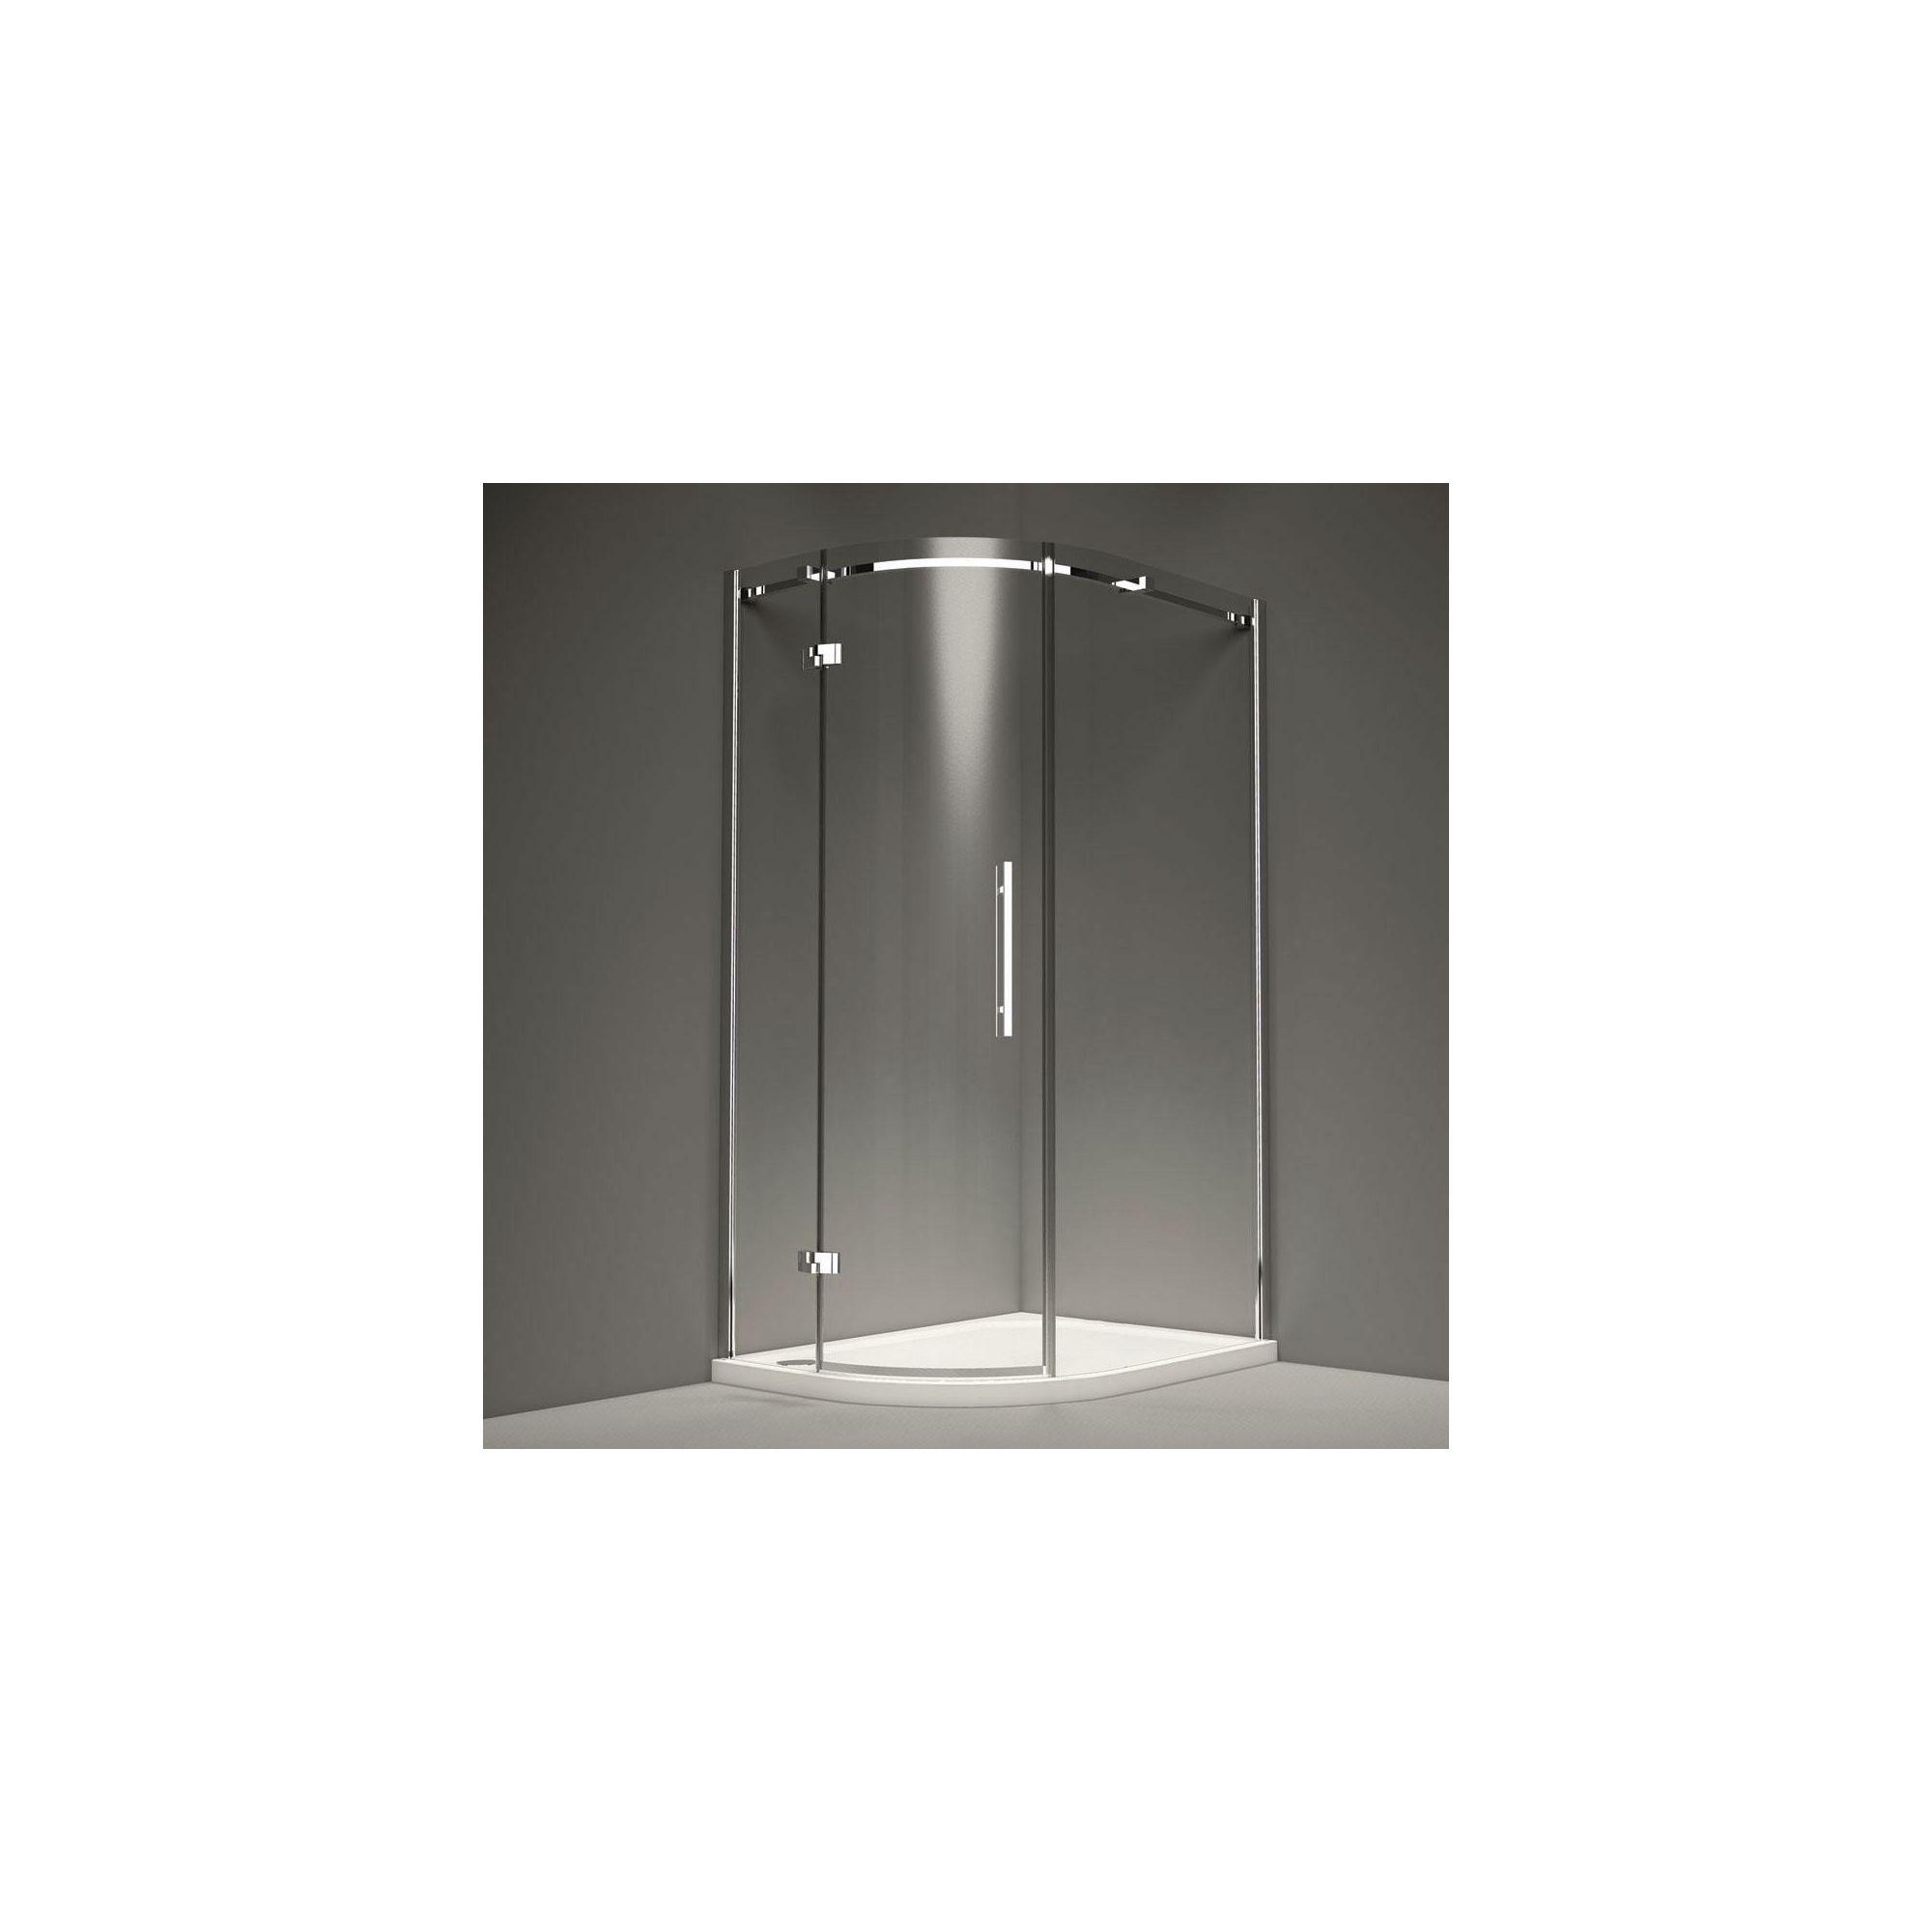 Merlyn Series 9 Offset Quadrant Shower Door, 1000mm x 800mm, 8mm Glass, Left Handed at Tesco Direct